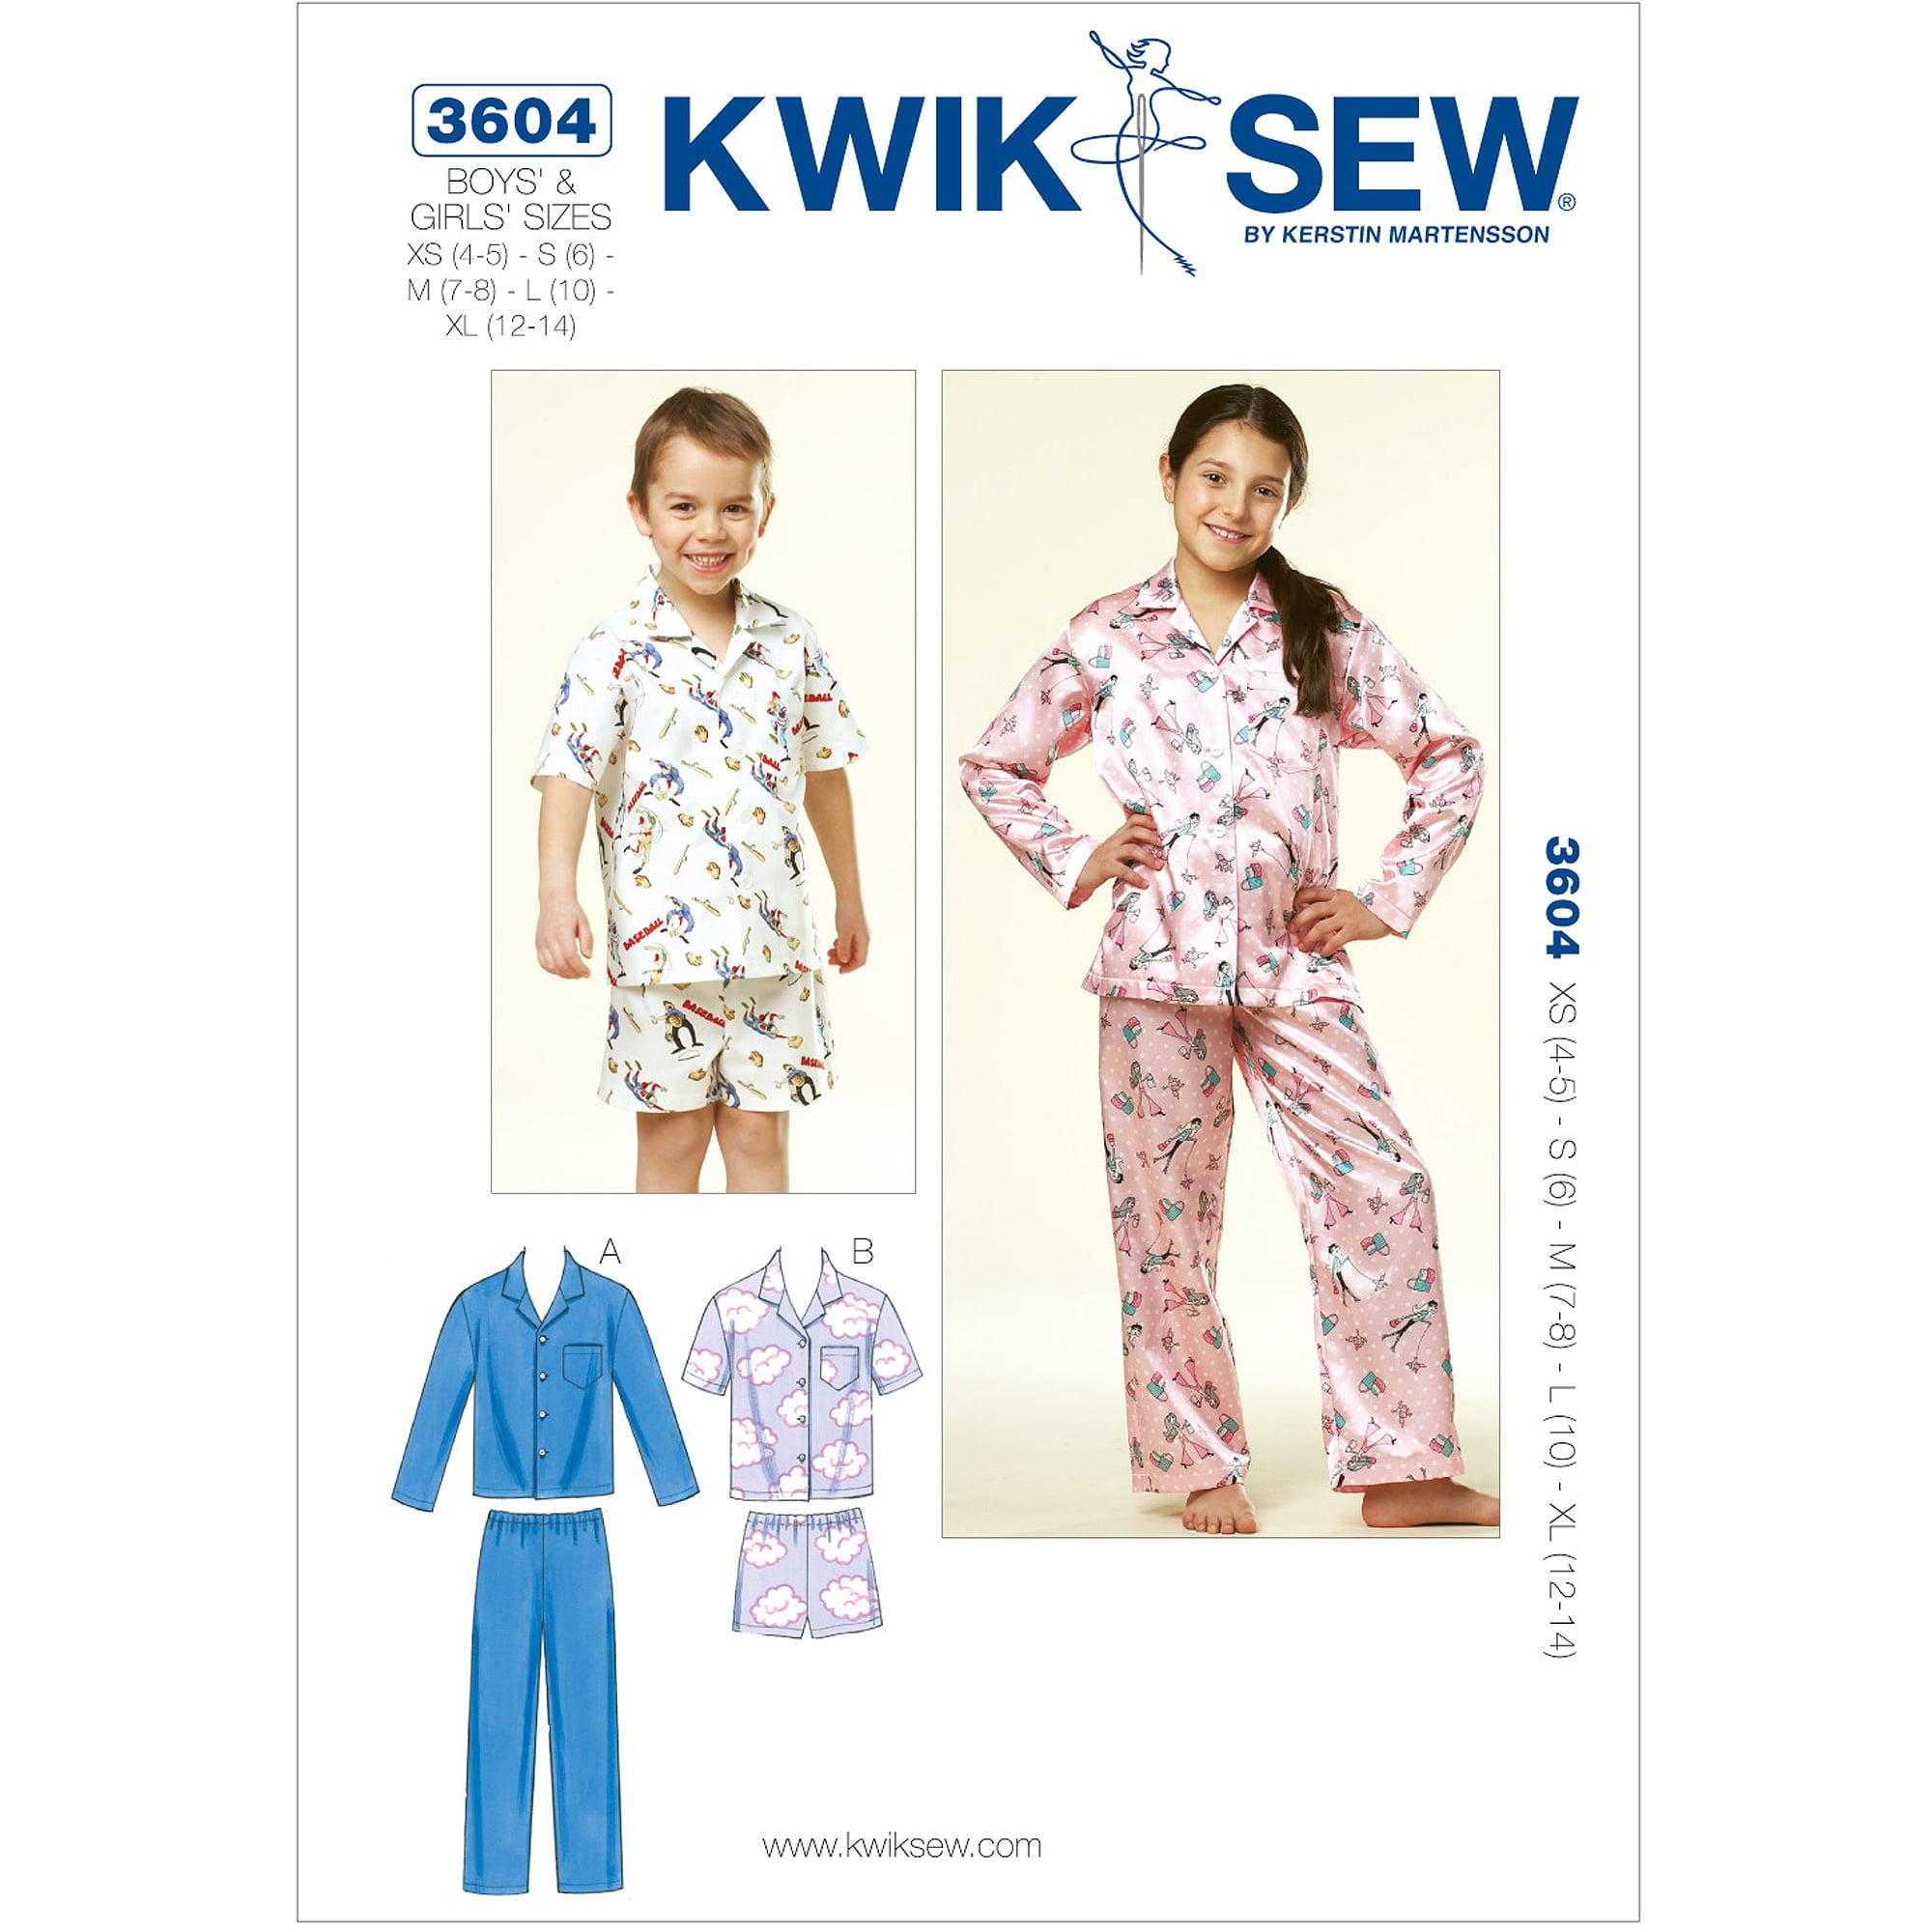 Kwik Sew Boys' and Girls' Pajamas, (XS, S, M, L, XL)